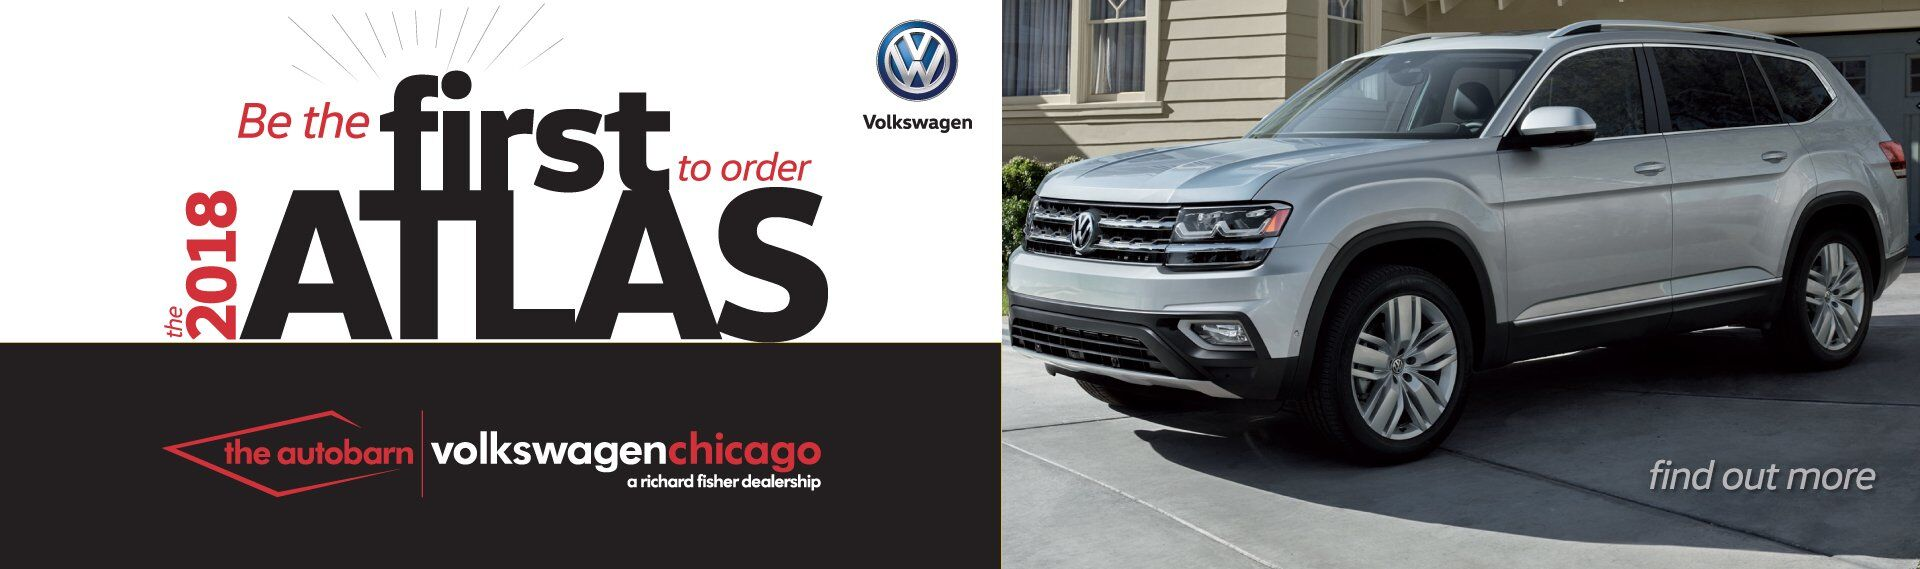 volkswagen vehicles chicago il volkswagen dealership